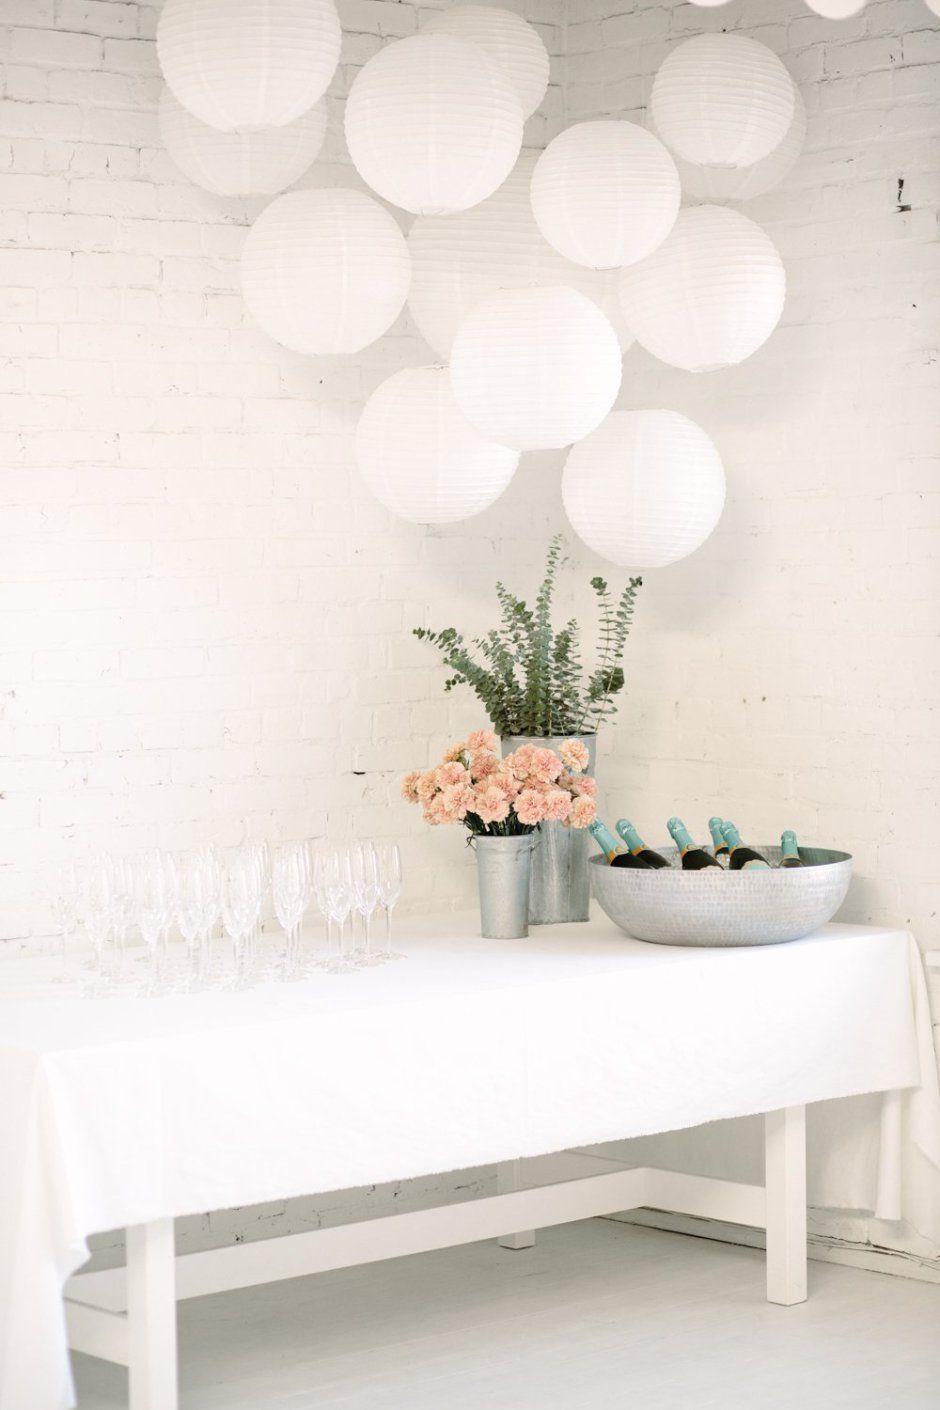 9 easy ways to decorate for a party c e l e b r a t e 9 easy ways to decorate for a party